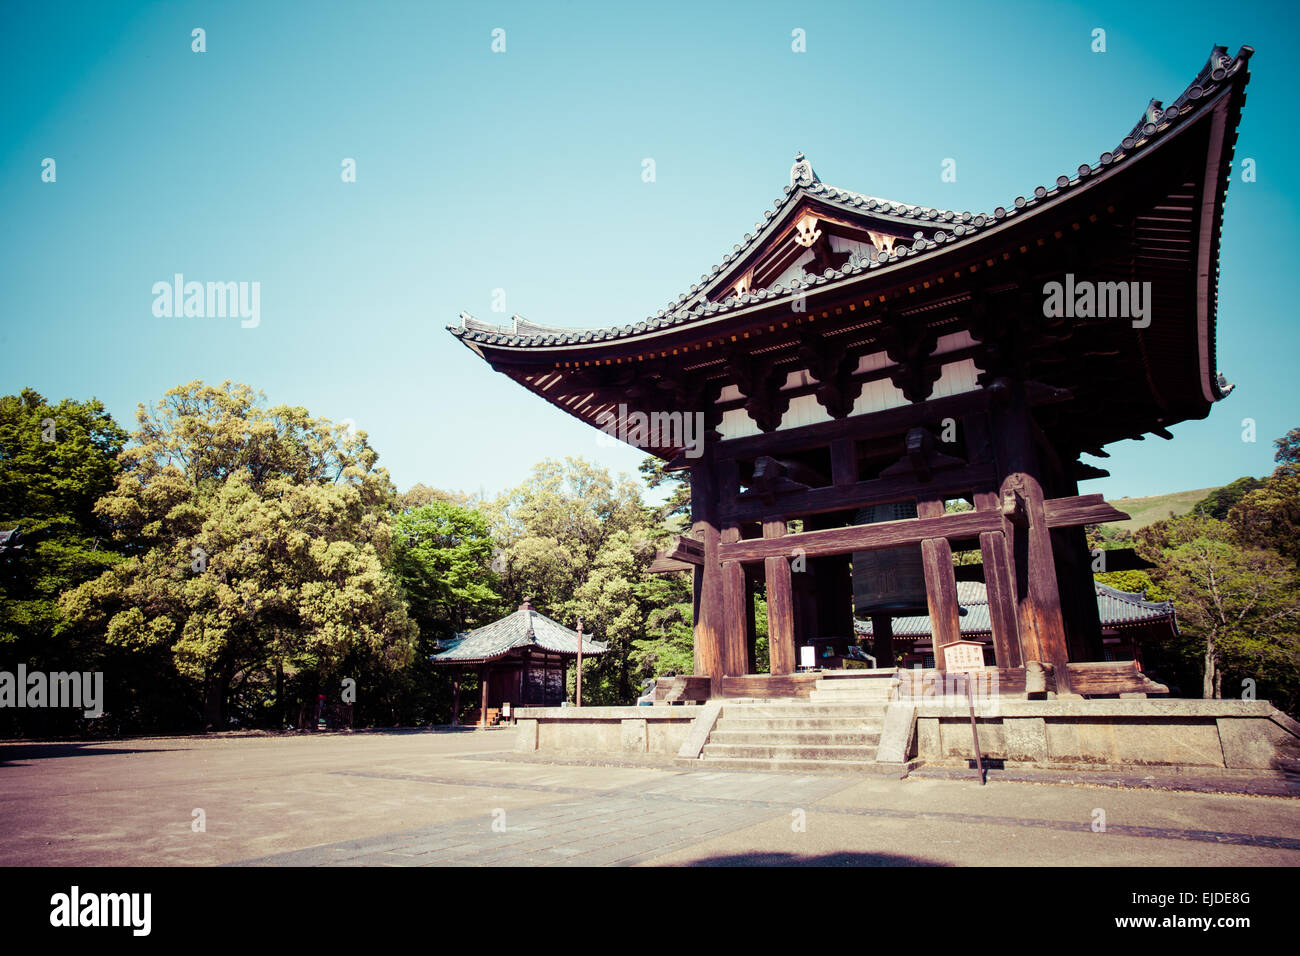 todaiji buddhist temple in the ancient japanese capital nara stock